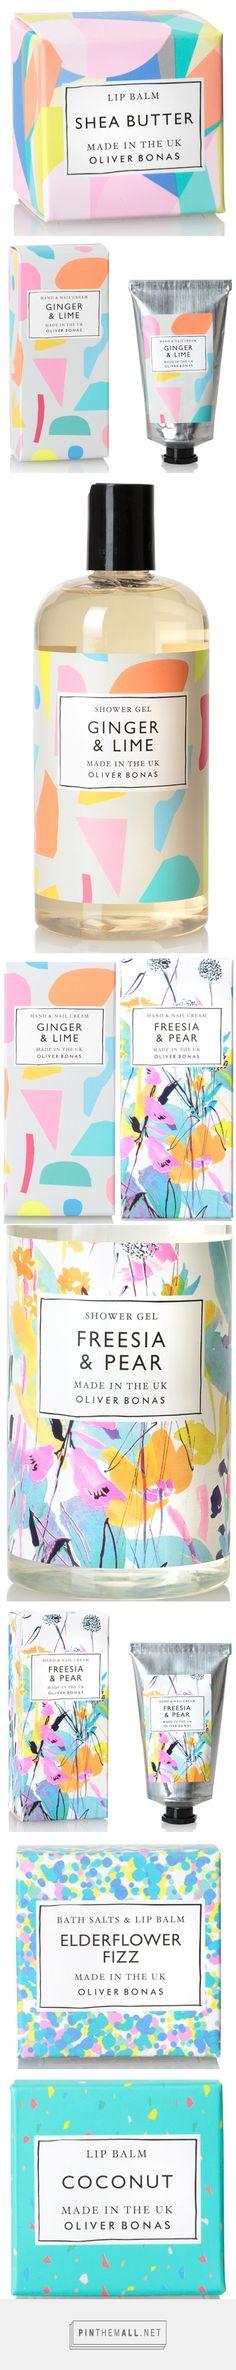 New Season of Oliver Bonas Packaging Label Design, Box Design, Branding Design, Package Design, Graphic Design, Candle Packaging, Pretty Packaging, Luxury Packaging, Brand Packaging